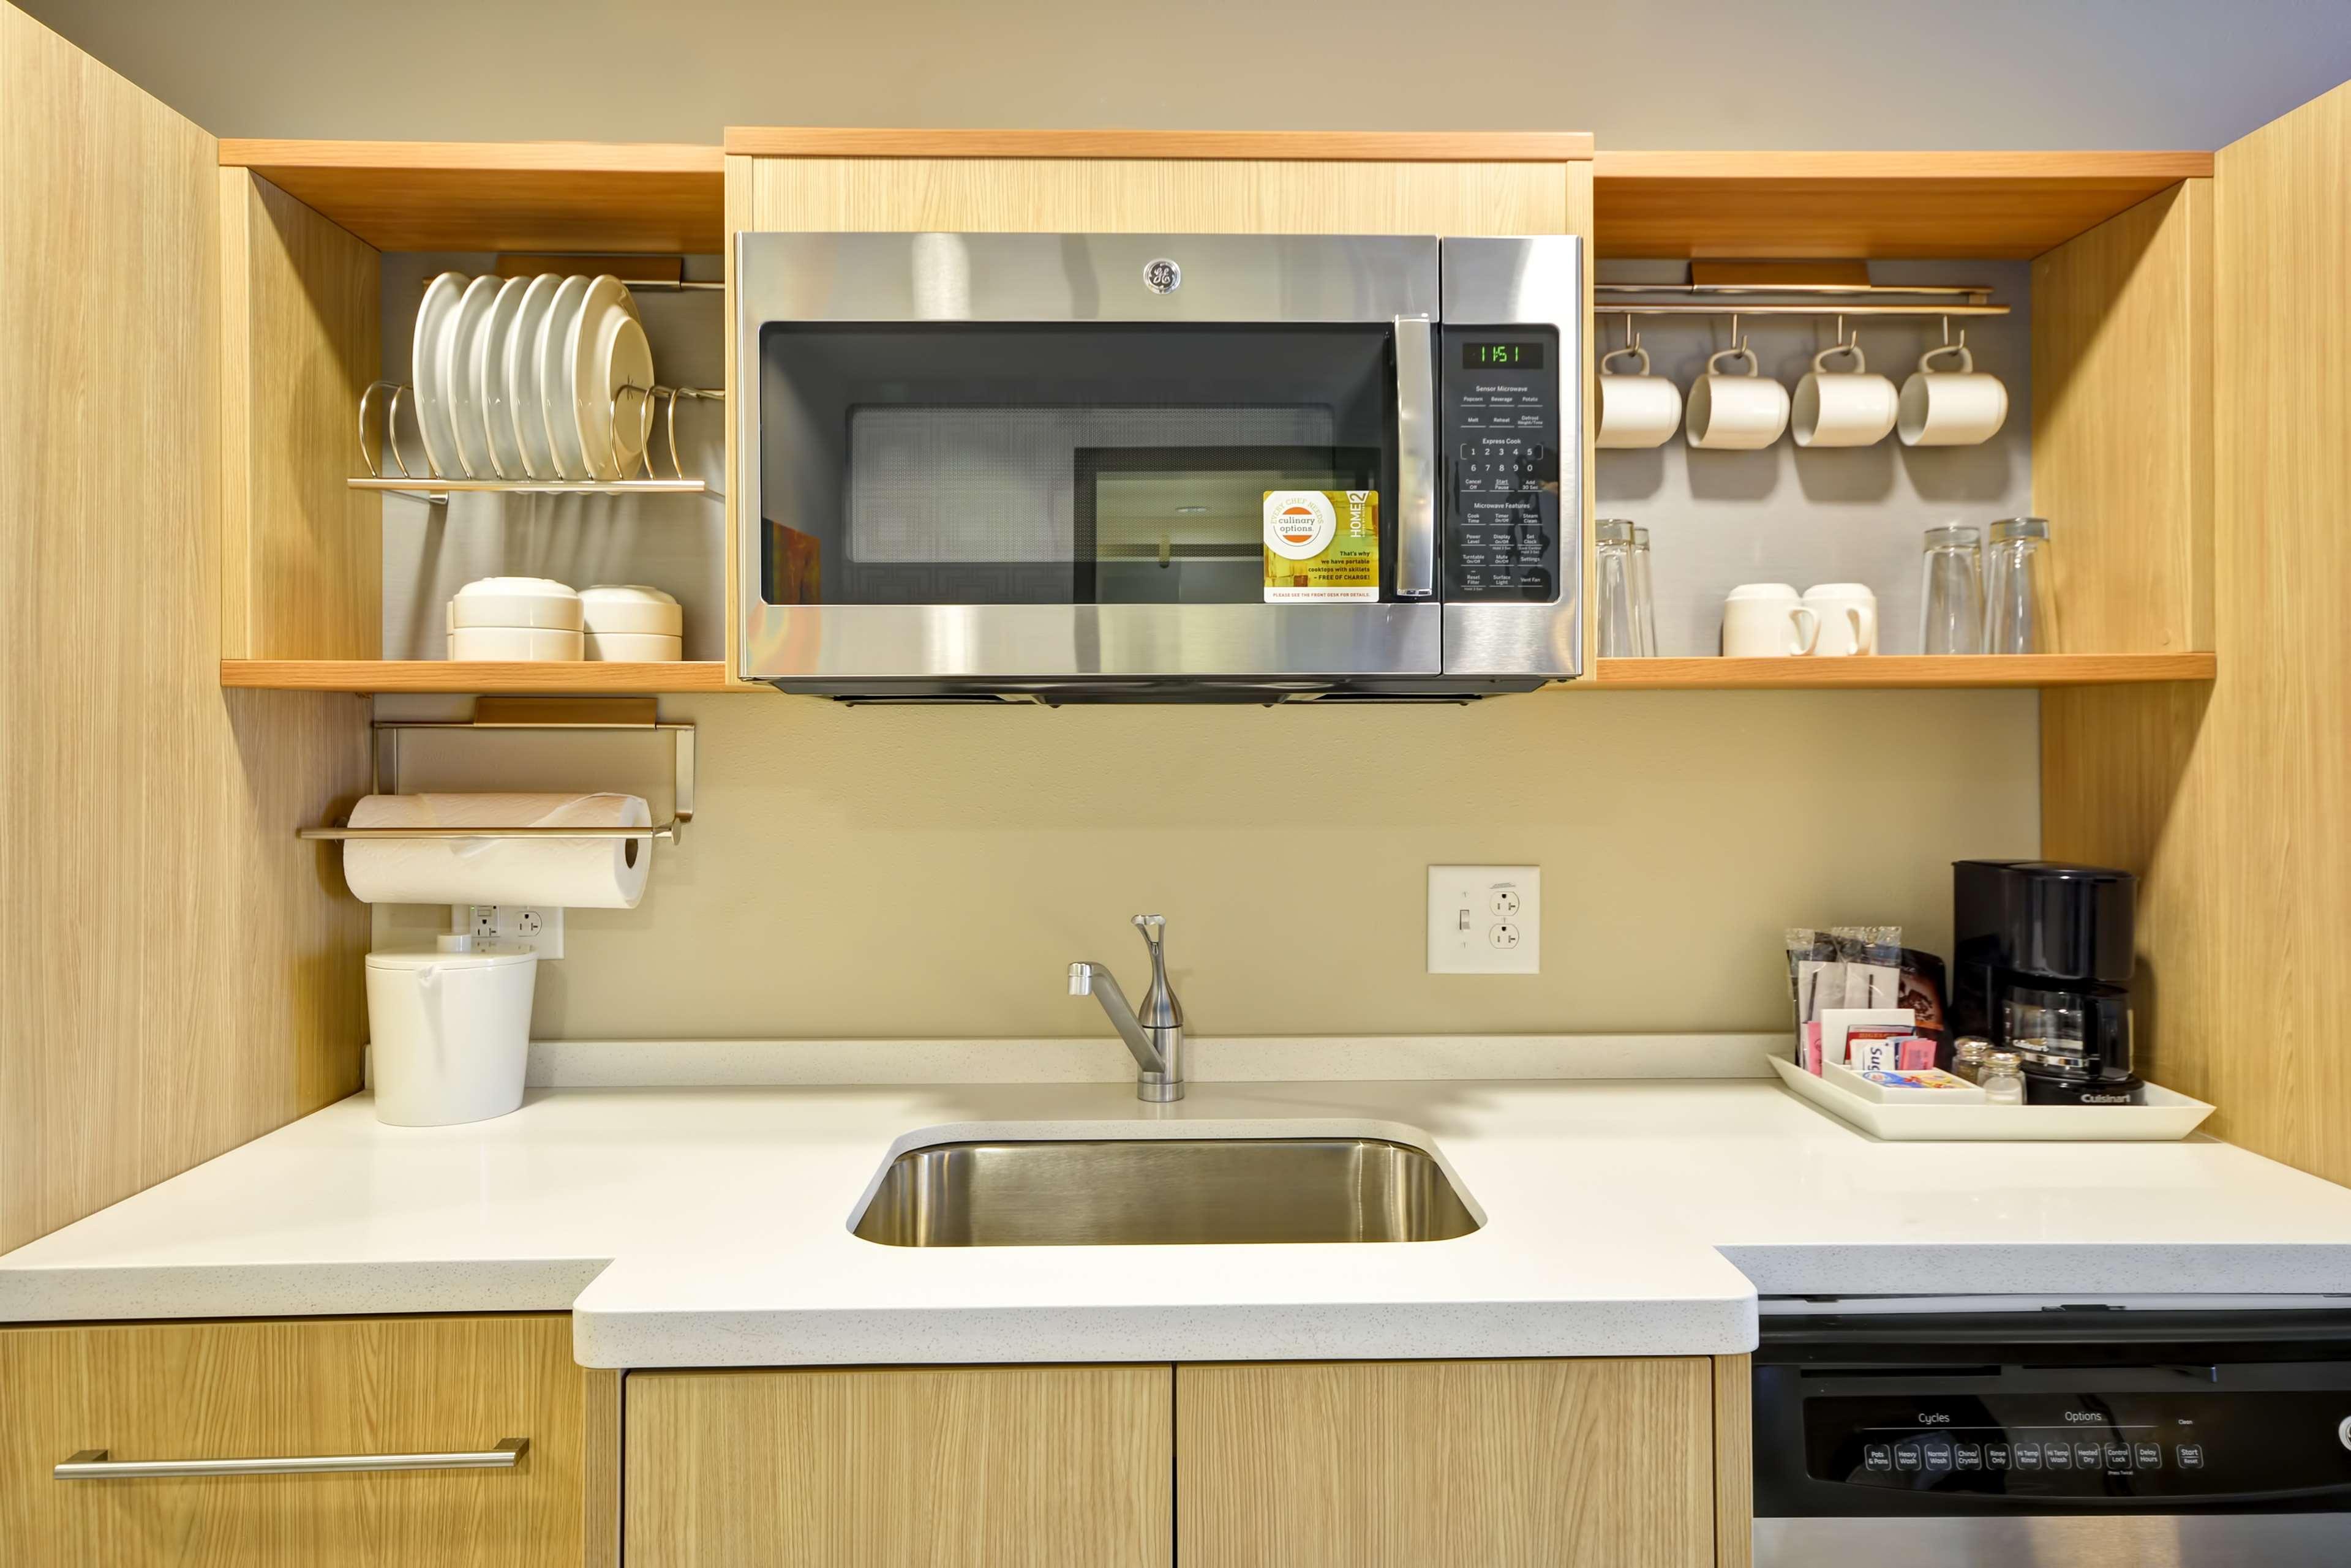 Home2 Suites by Hilton  St. Simons Island image 37